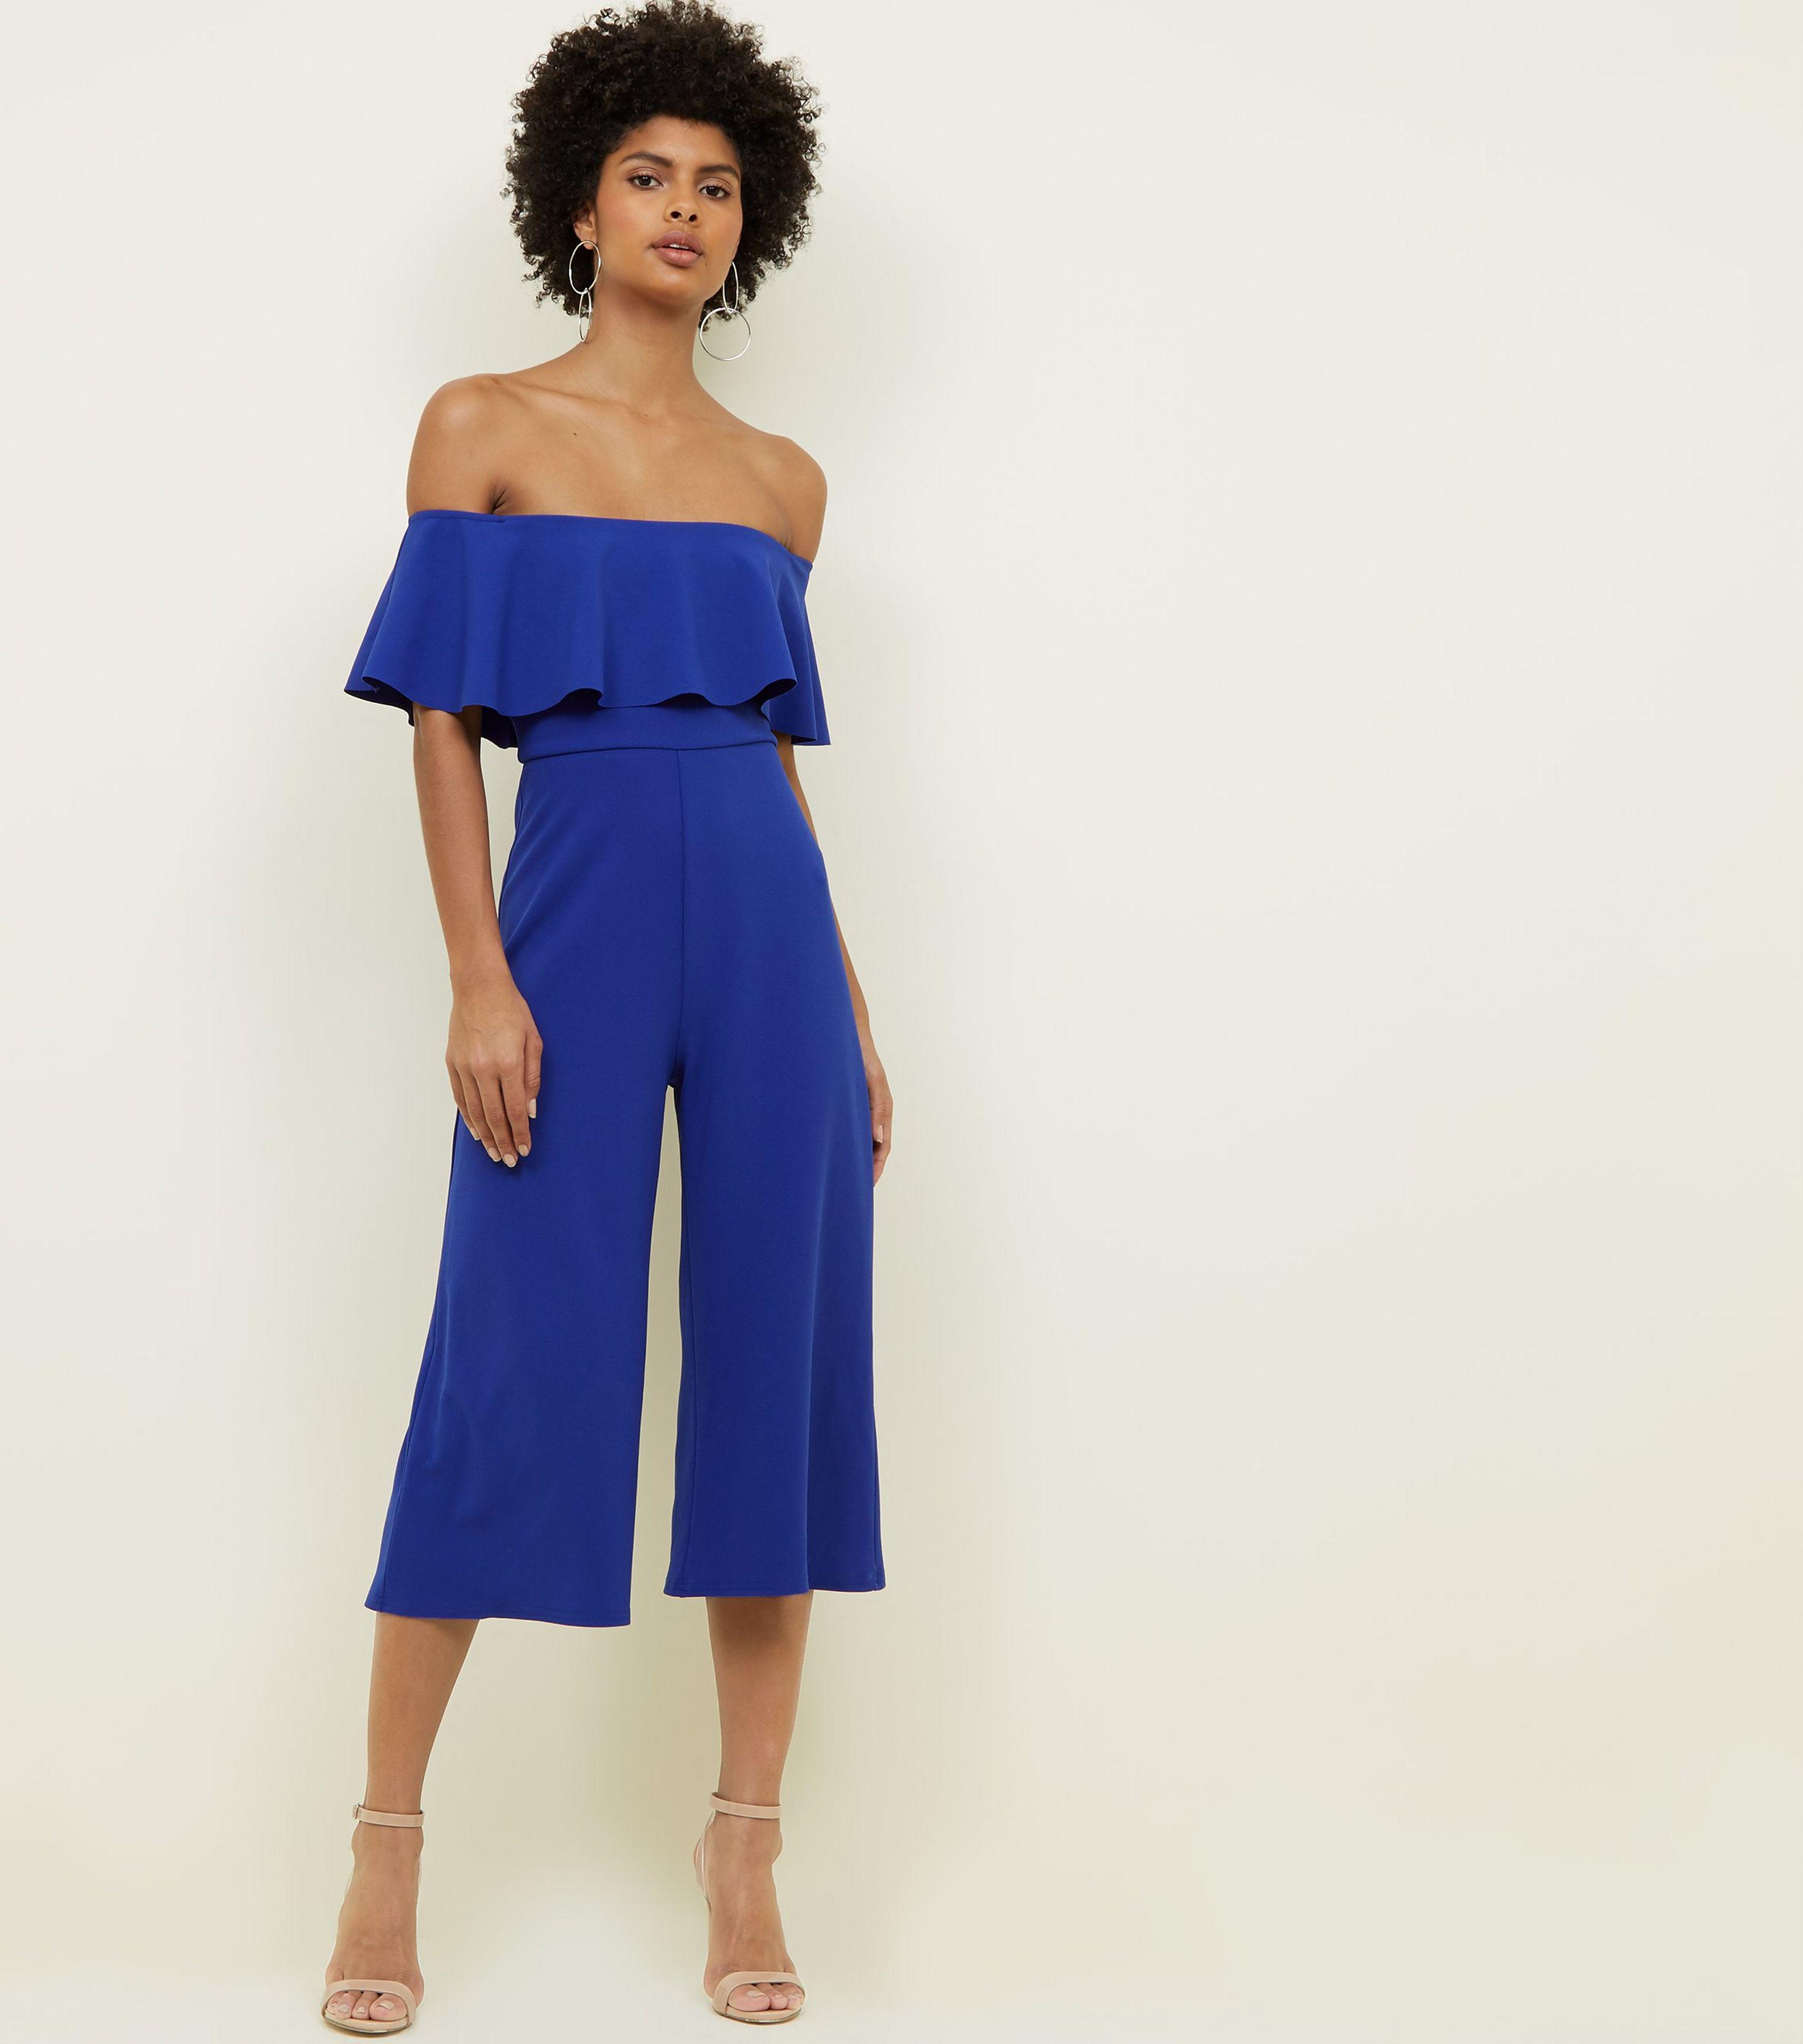 cf2e9ed5706a New Look Blue Frill Bardot Culotte Jumpsuit in Blue - Lyst